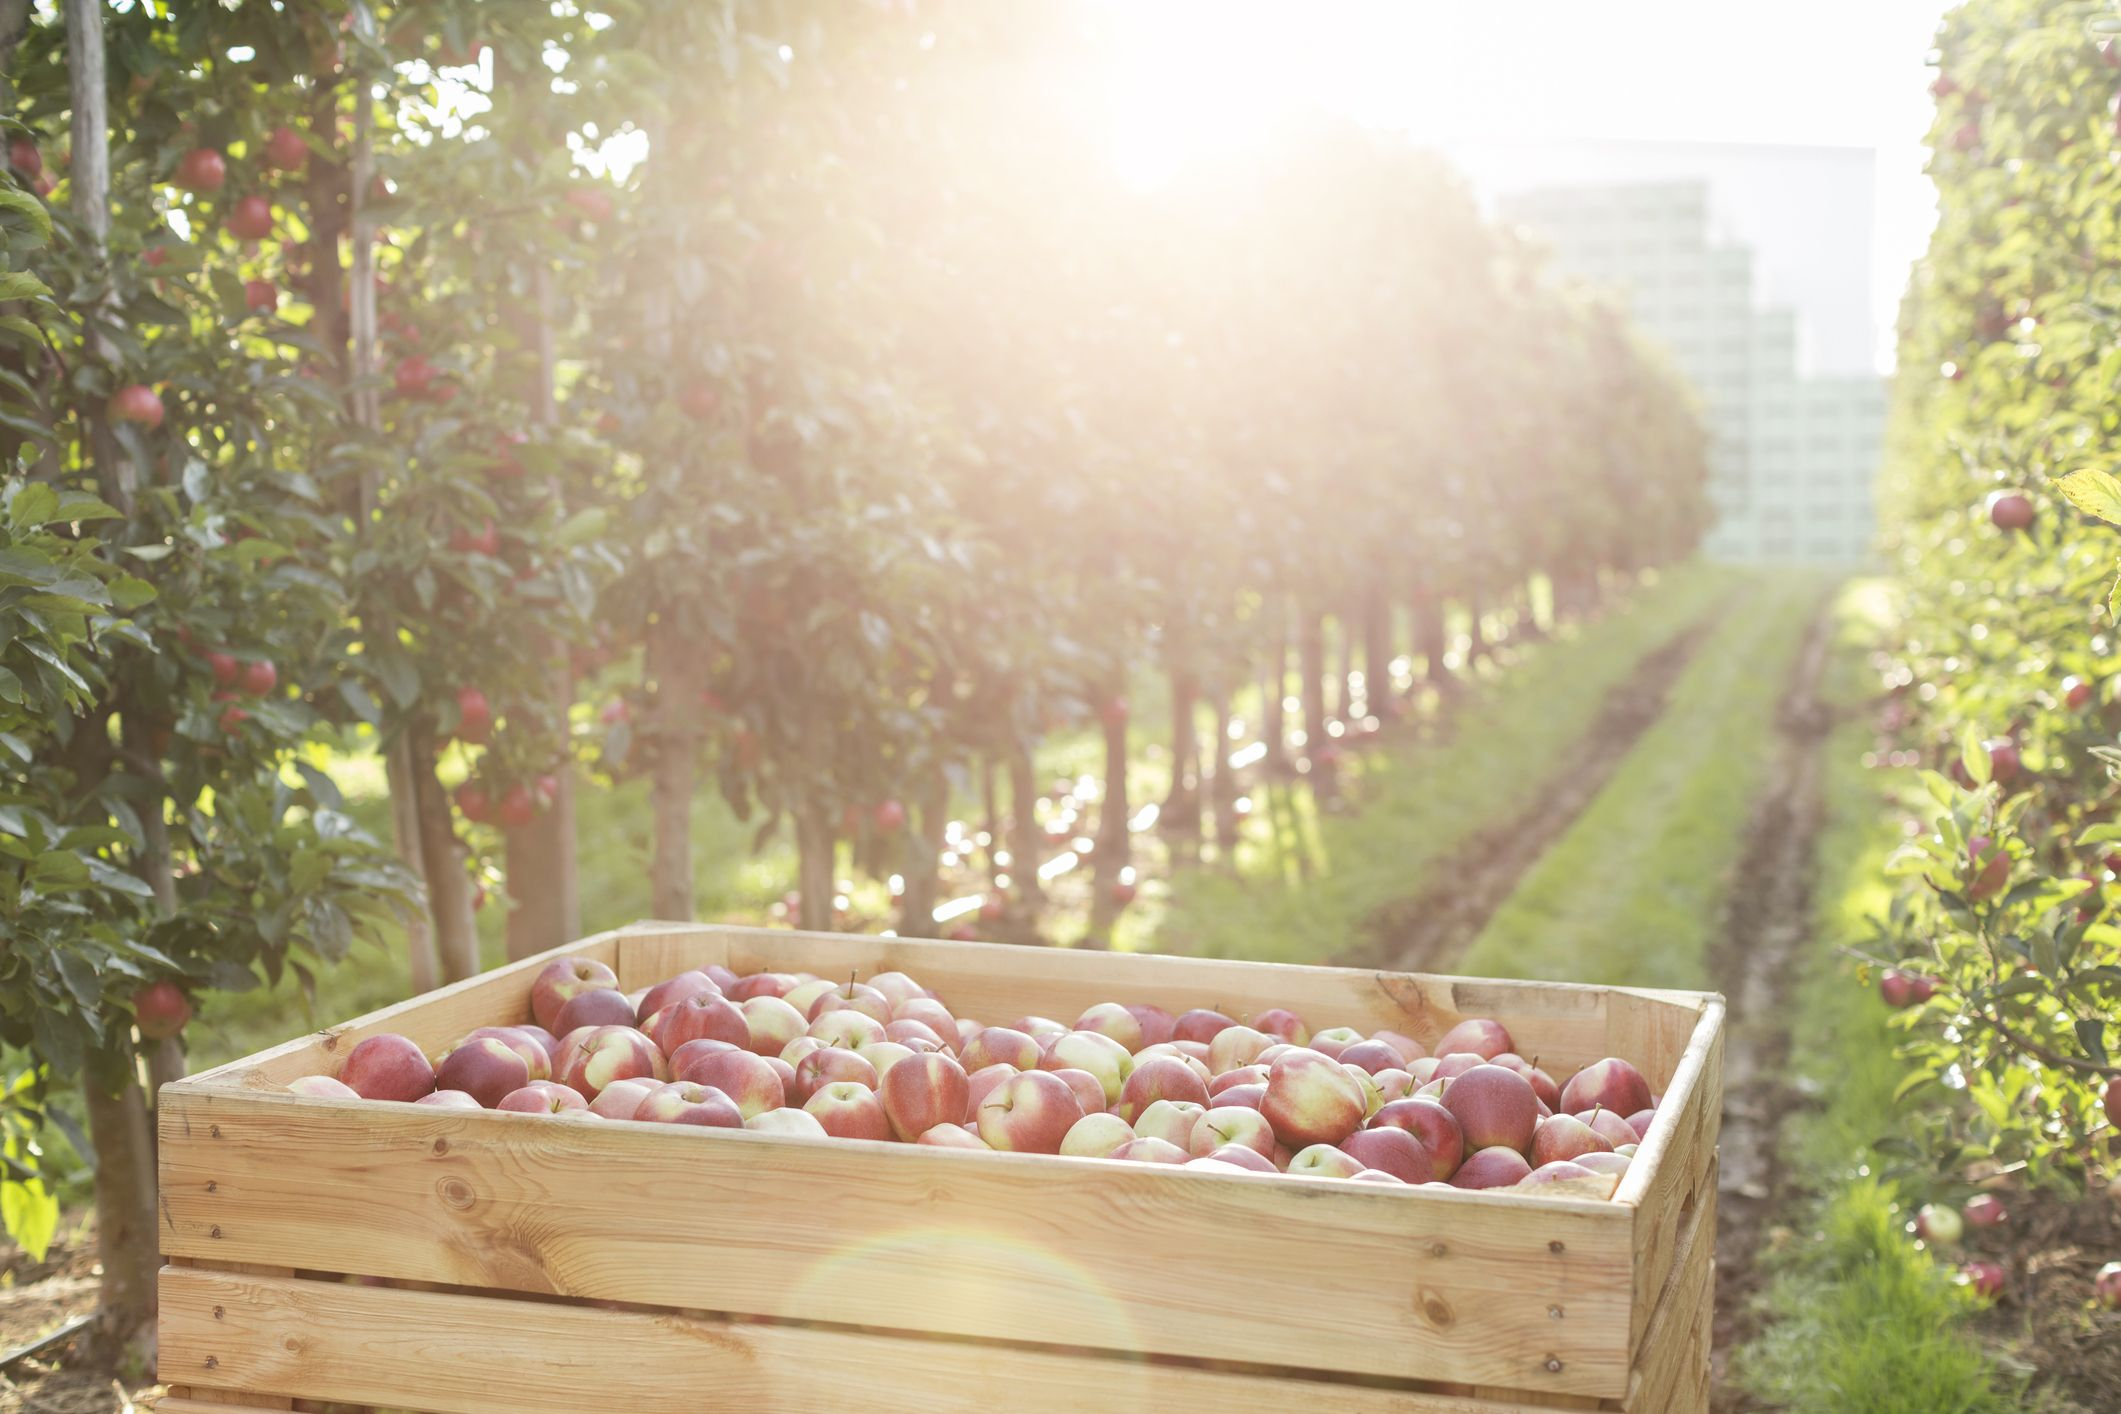 Red apples in bin in sunny orchard